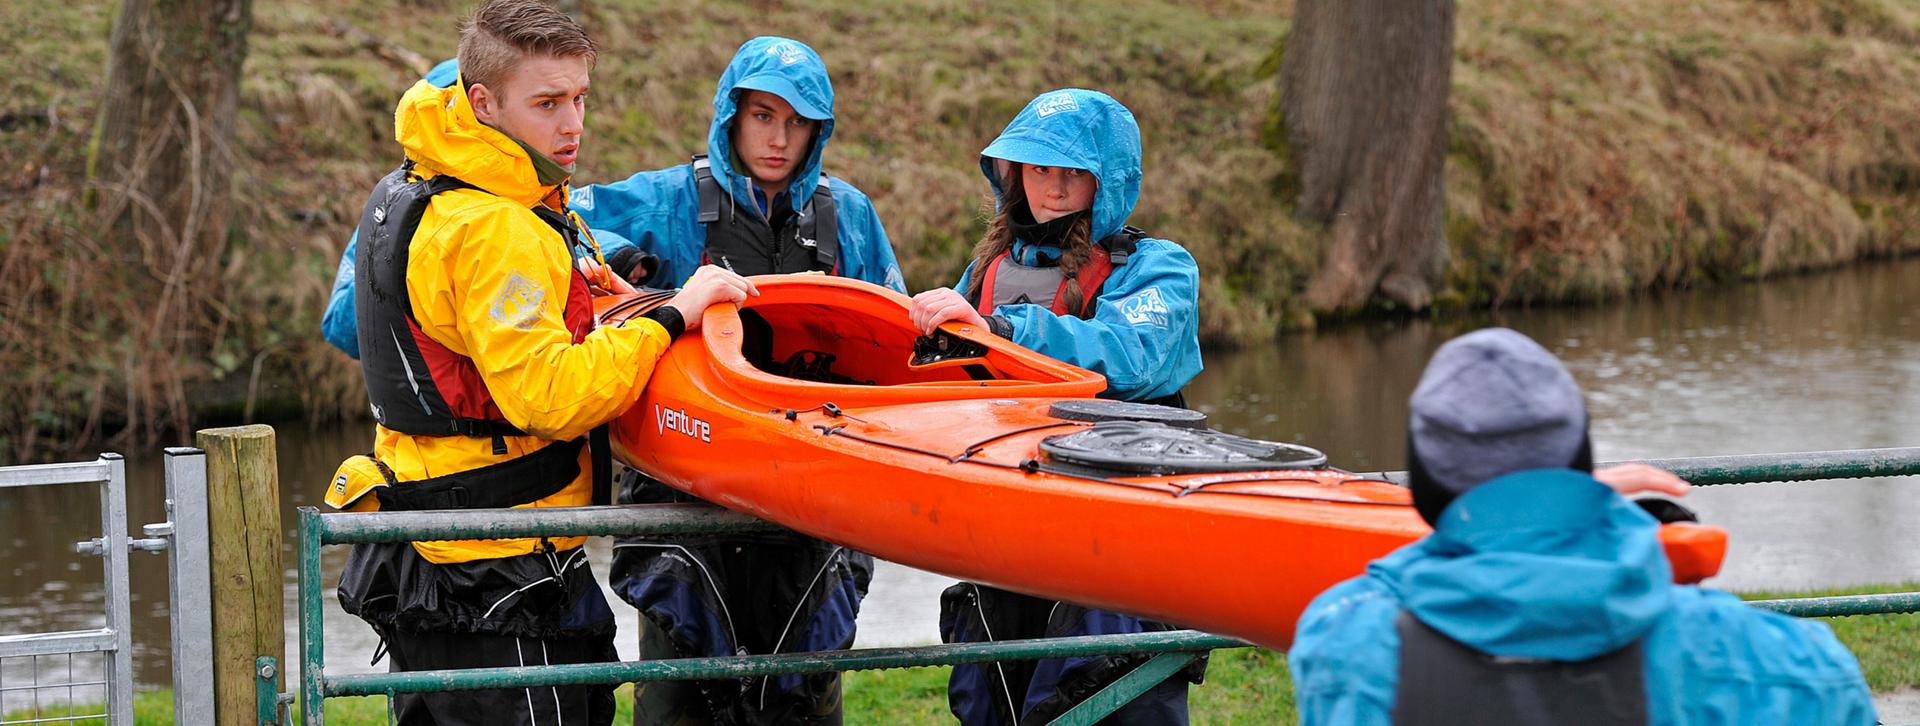 Canoe group teamwork